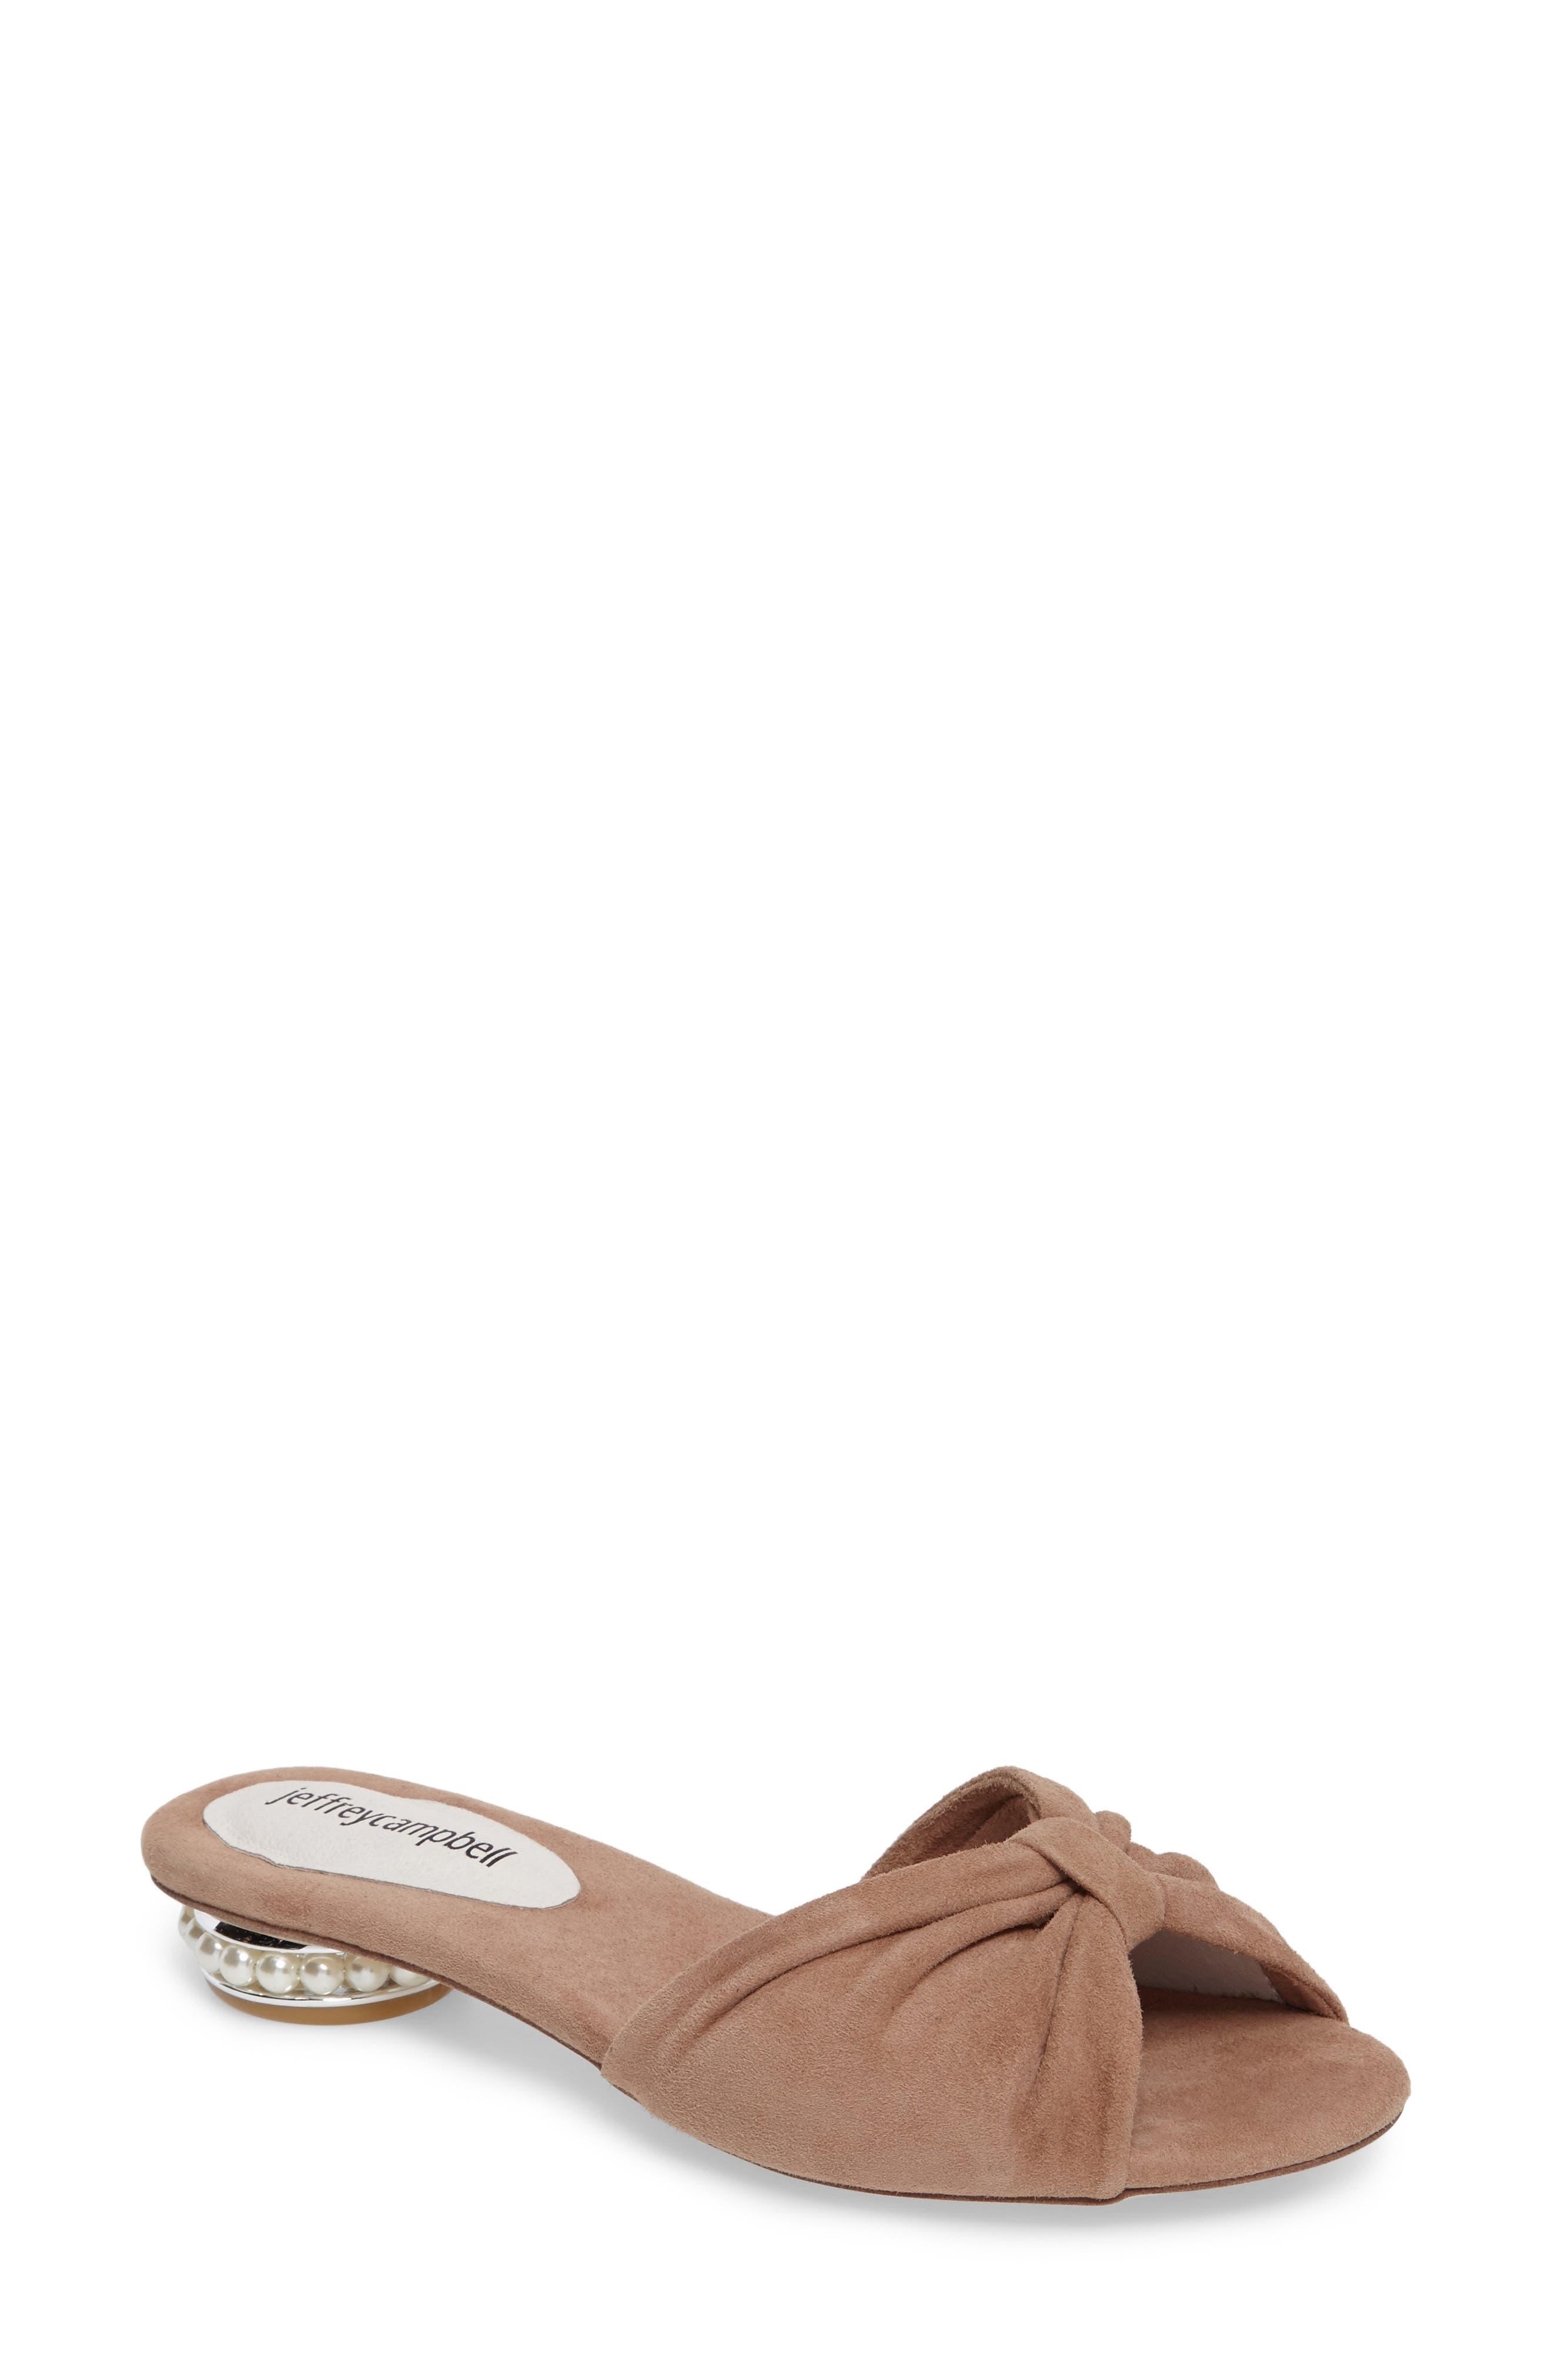 Alternate Image 1 Selected - Jeffrey Campbell Turbina Embellished Slide Sandal (Women)